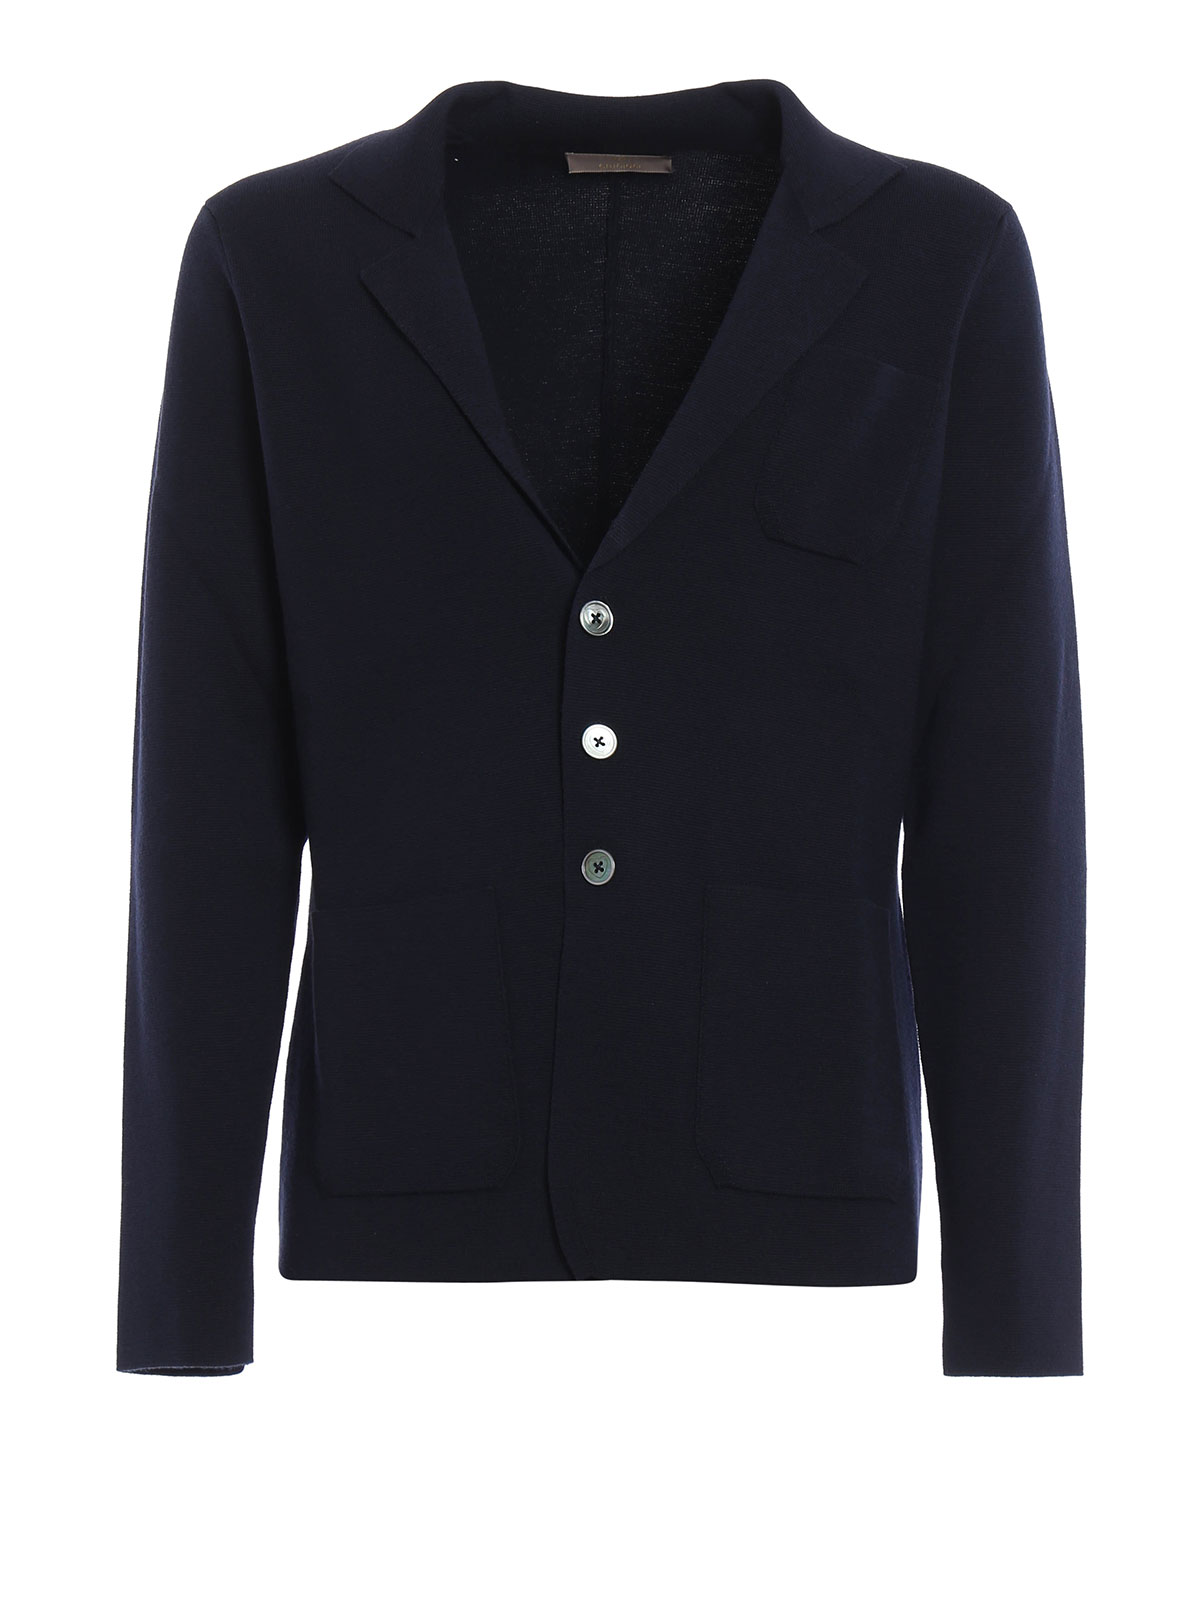 new product 94993 eee15 Cruciani - Blazer destrutturato in lana - giacche blazer ...